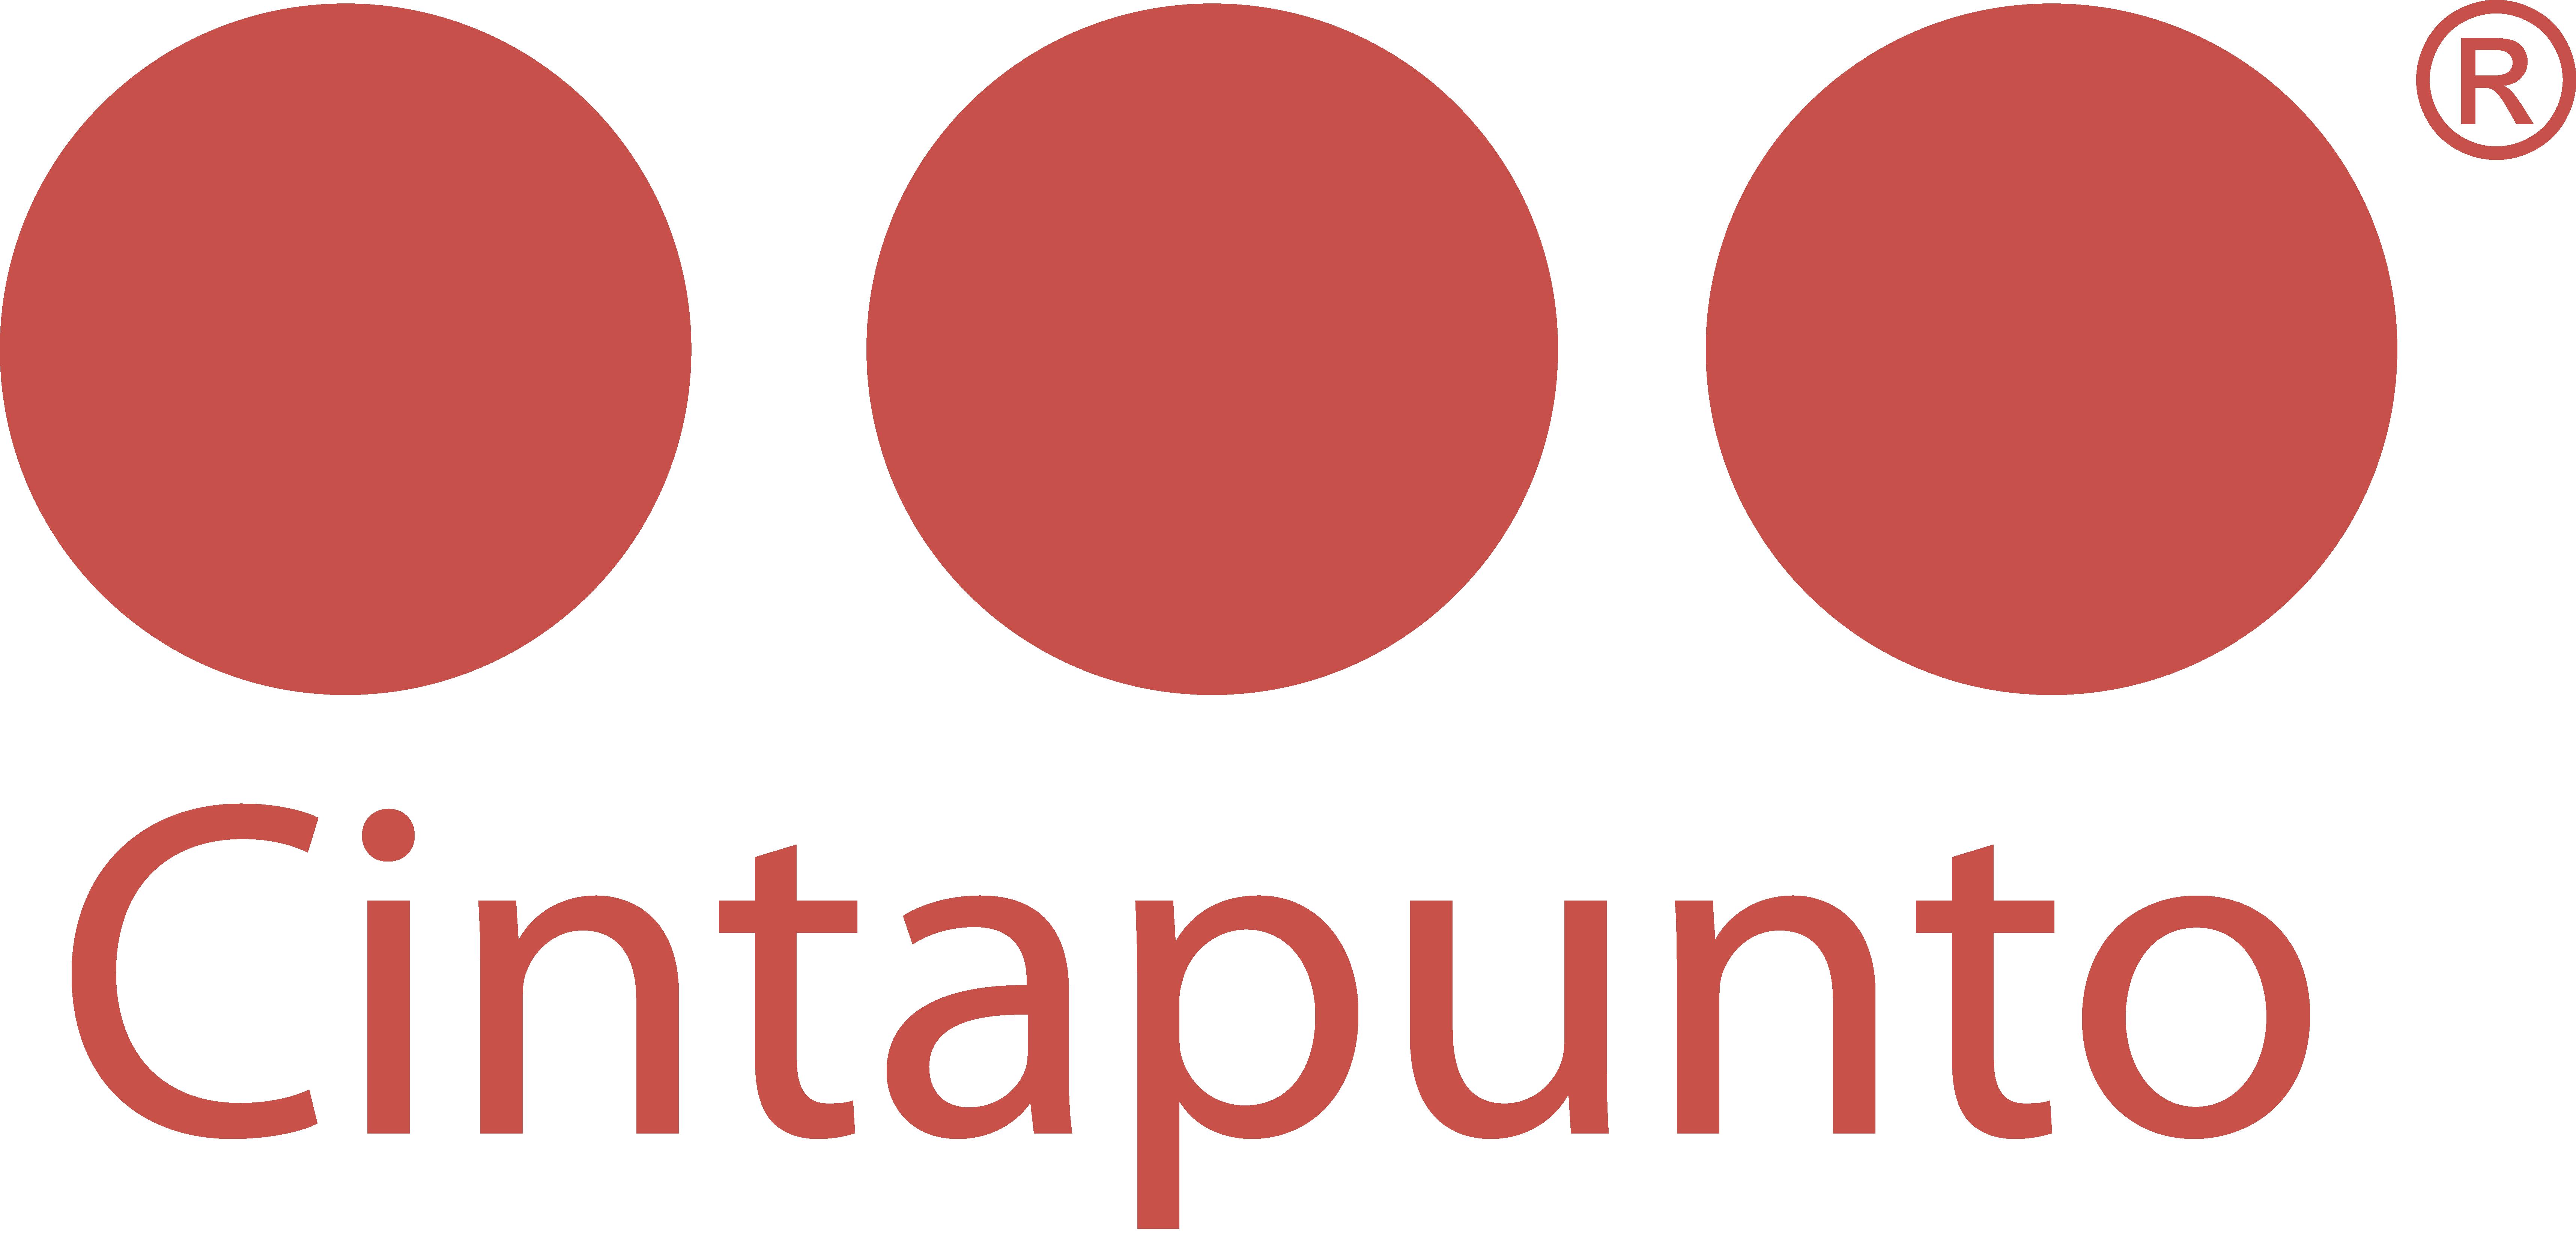 Cintapunto®